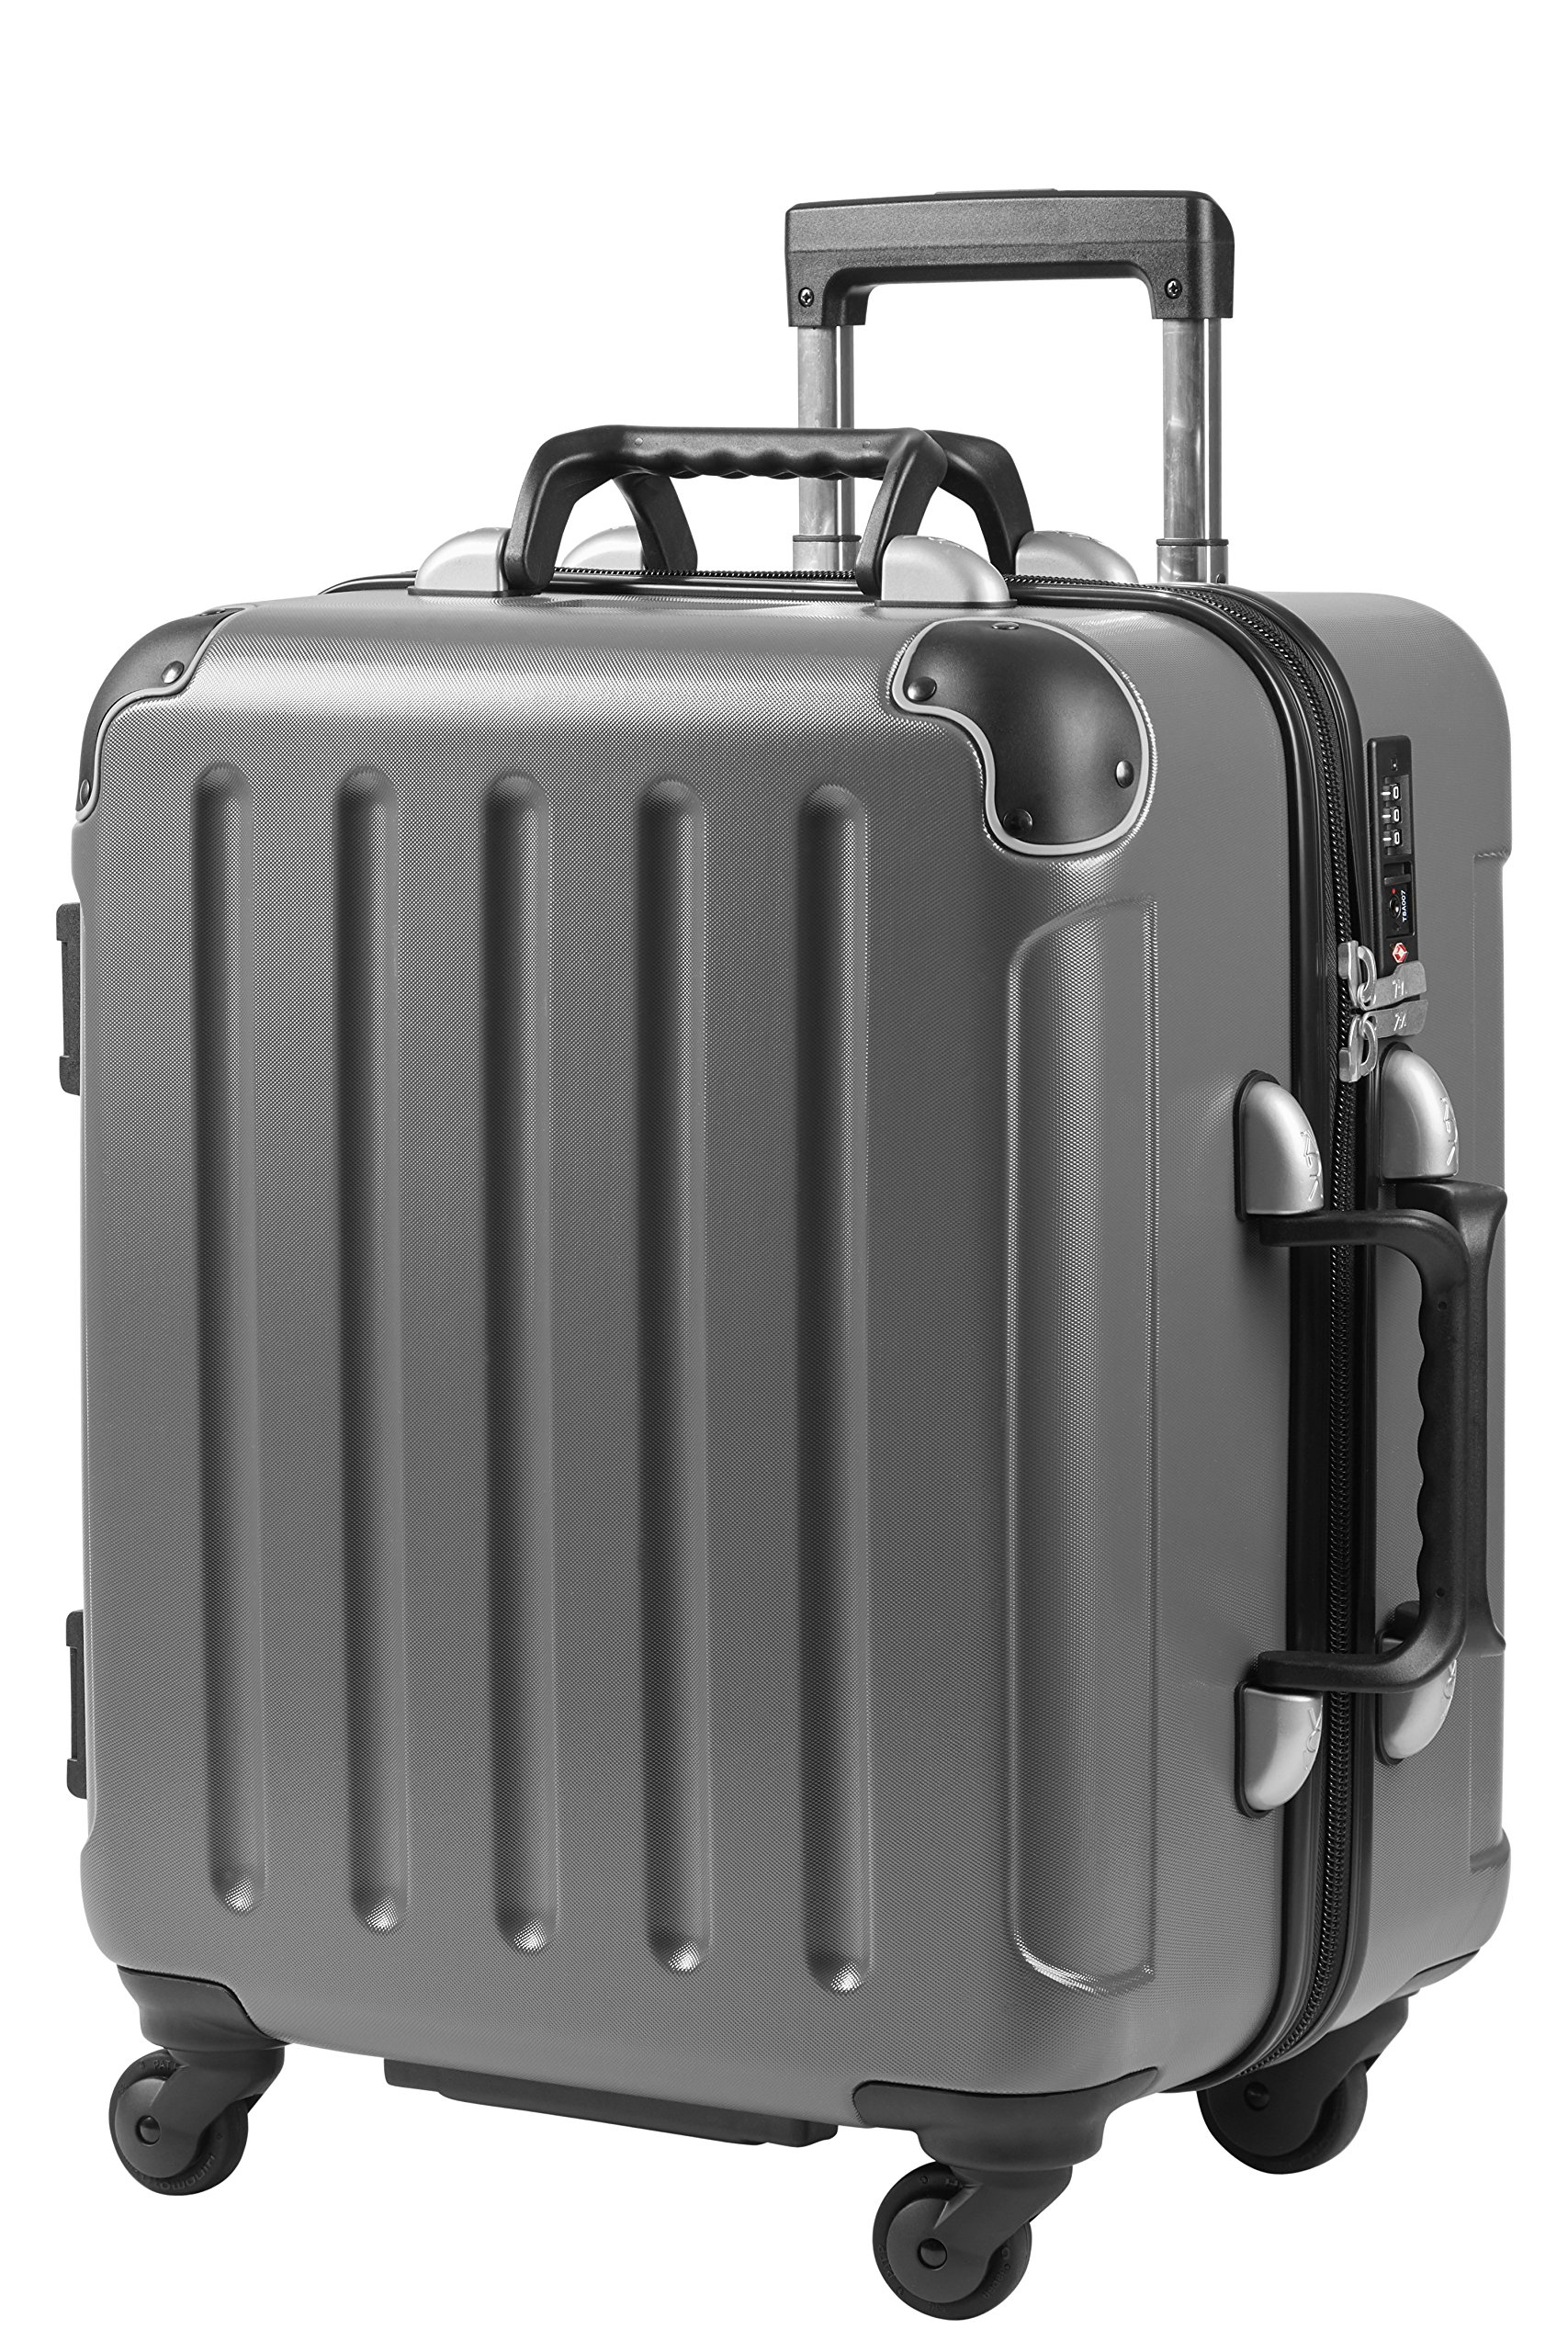 VinGardeValise Petite | Wine Travel Suitcase | All-purpose Luggage | TSA & FAA Compliant | ( Small Size 22.5'') 8 Bottles (Grey) by Vin Garde Valise